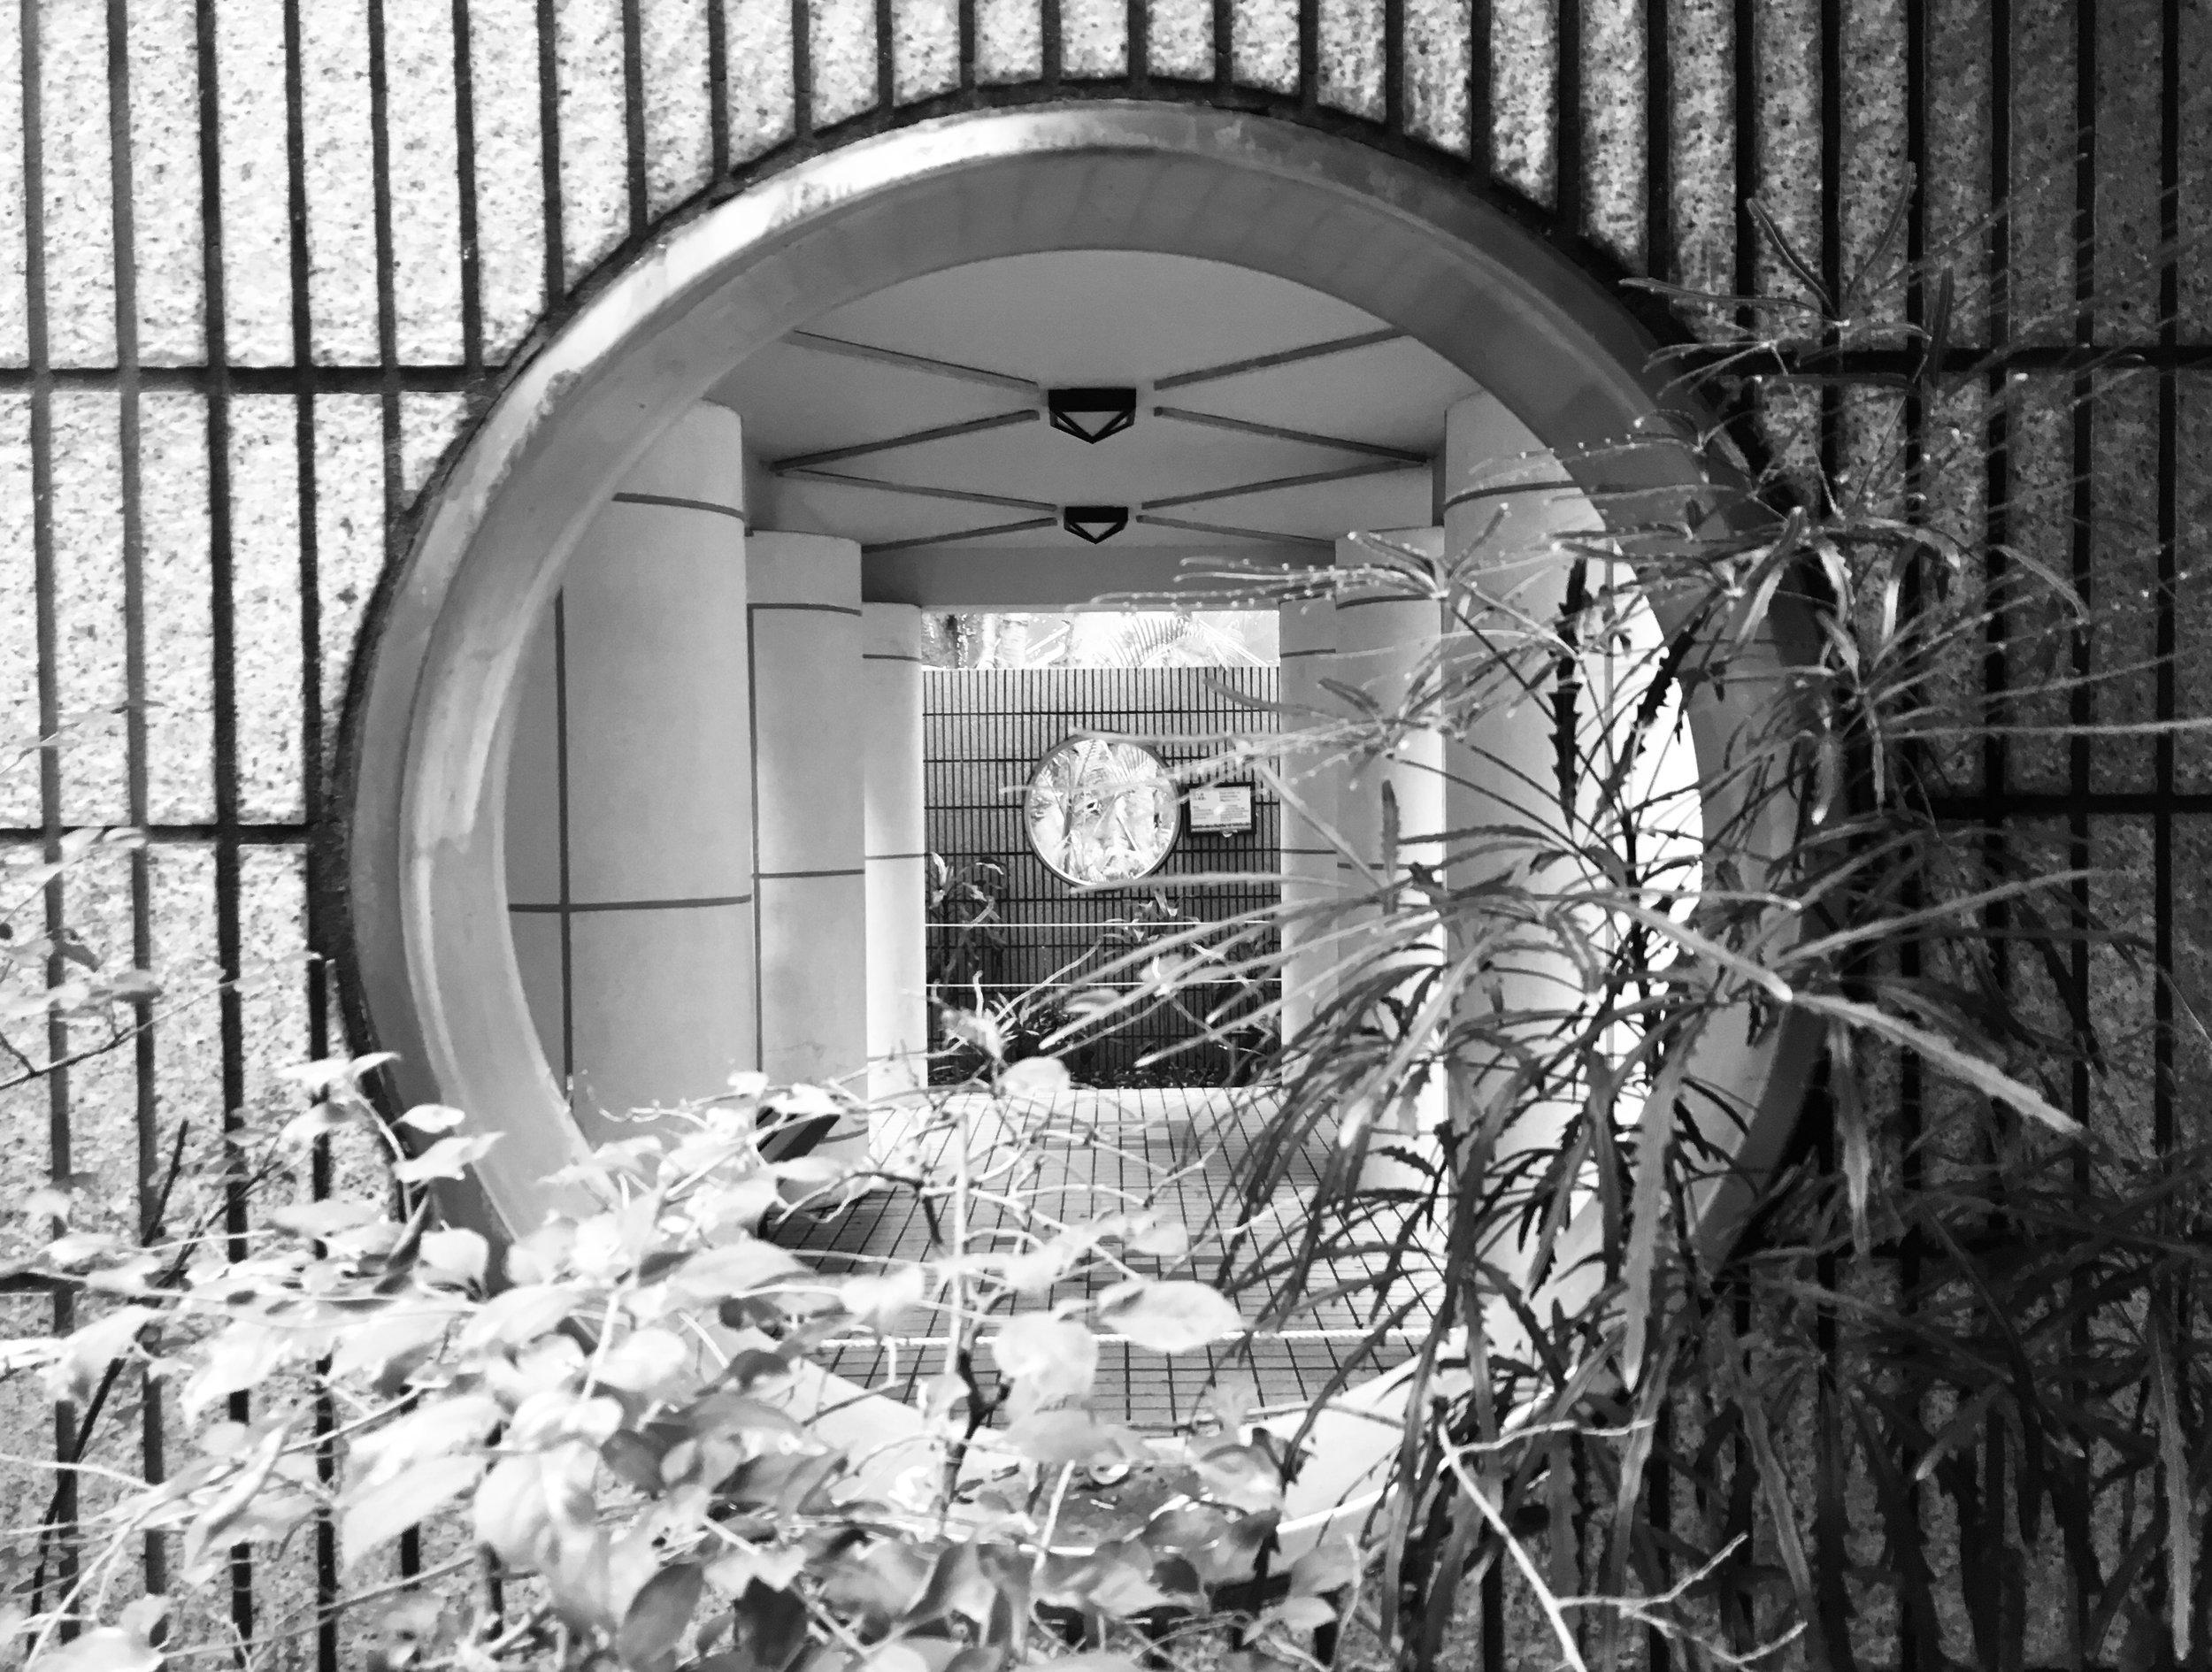 Through the window © Naida Ginnane 2018, iPhone 6, Camera on 'Mono' setting.